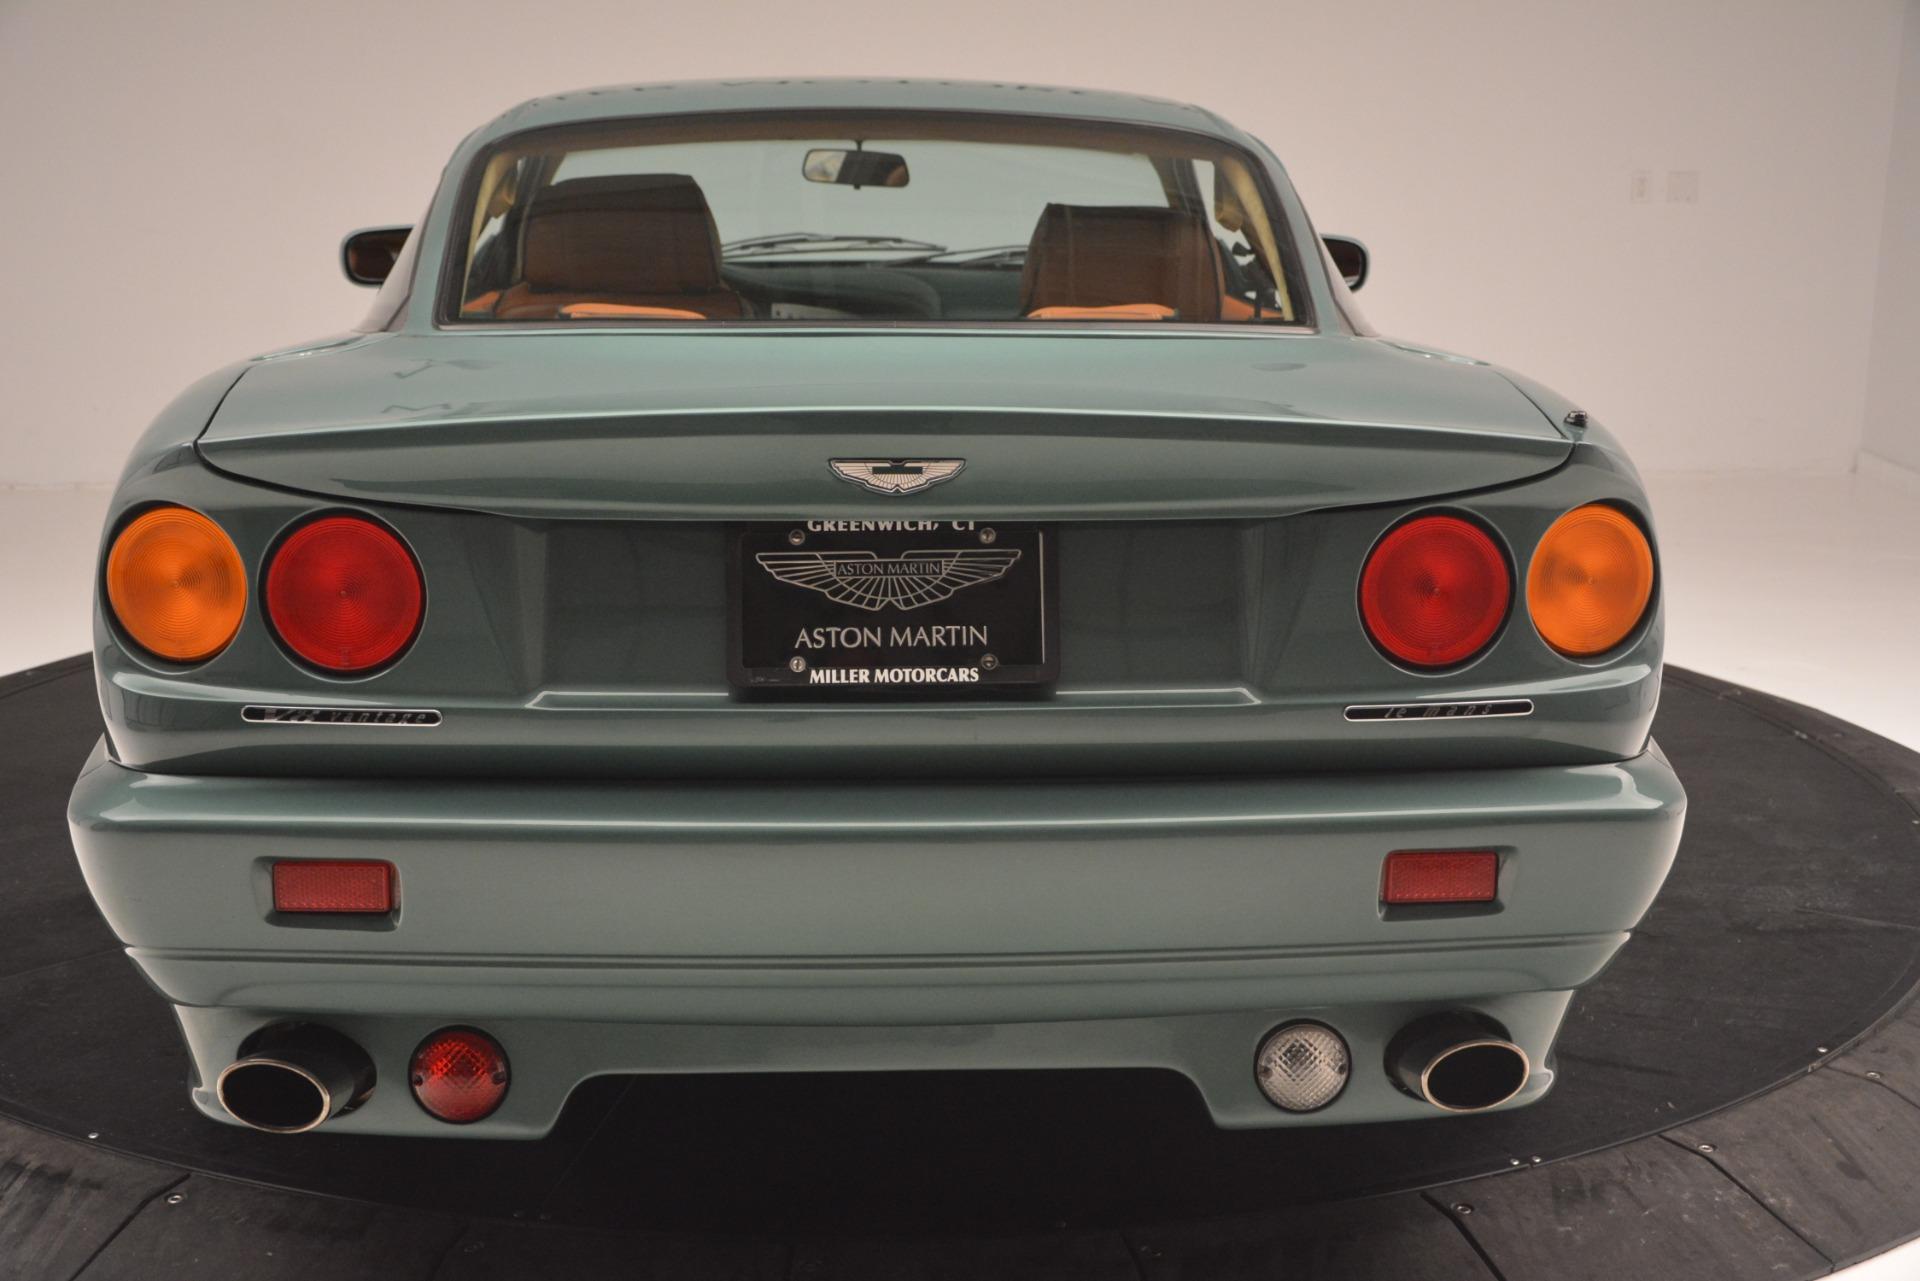 Used 1999 Aston Martin V8 Vantage Le Mans V600 Coupe For Sale In Greenwich, CT. Alfa Romeo of Greenwich, 7449C 2789_p42